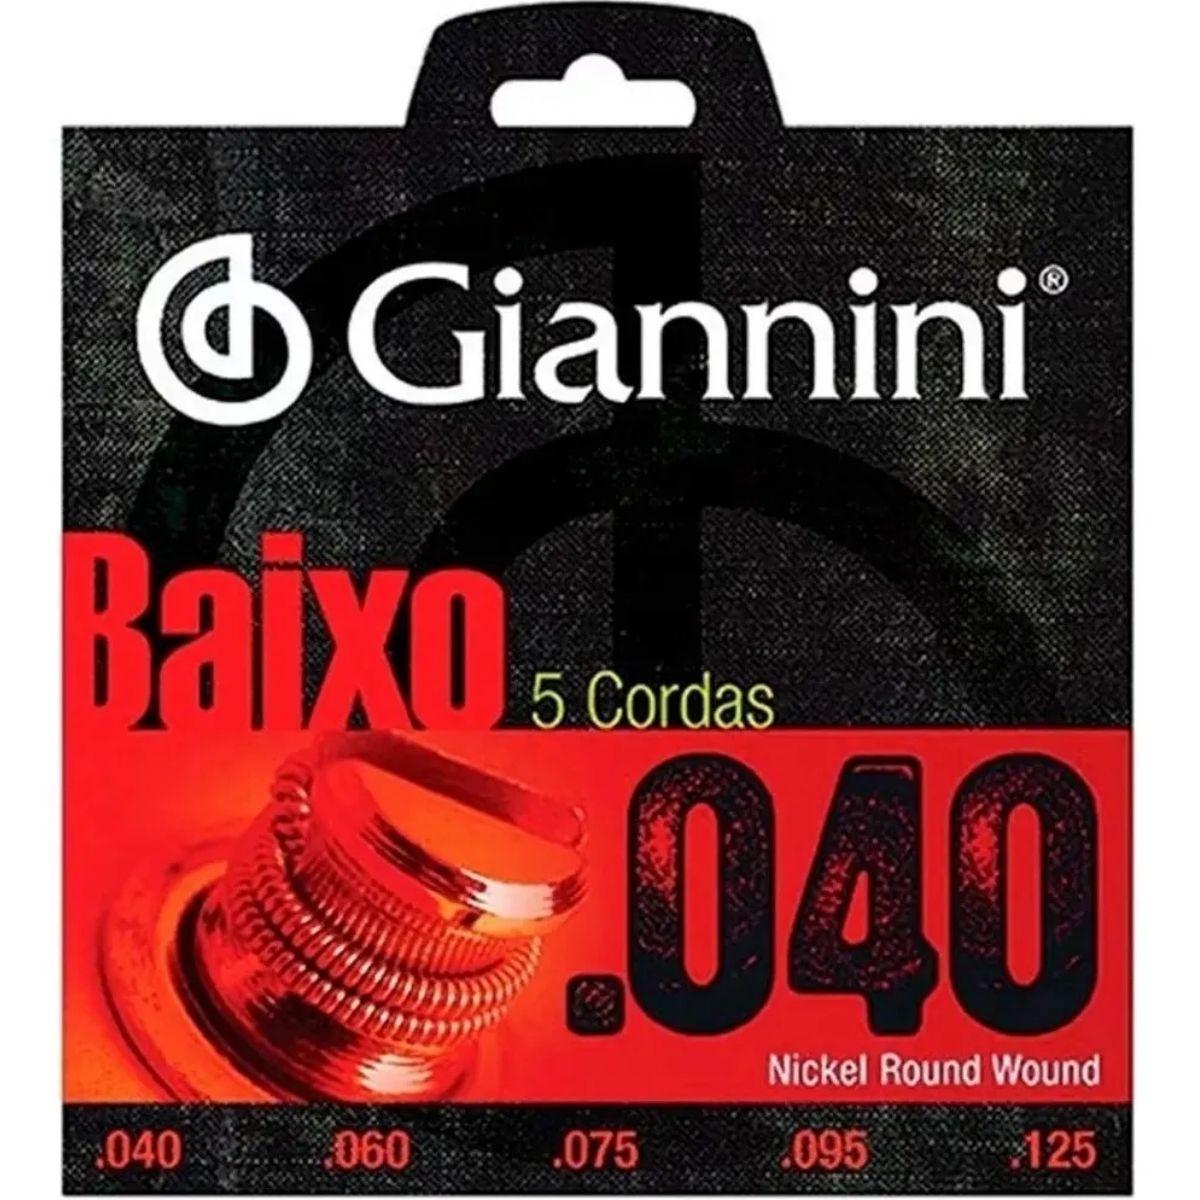 Encordoamento Contra Baixo 5 Cordas Giannini Niquel Geebrl 5 0.40 Leve